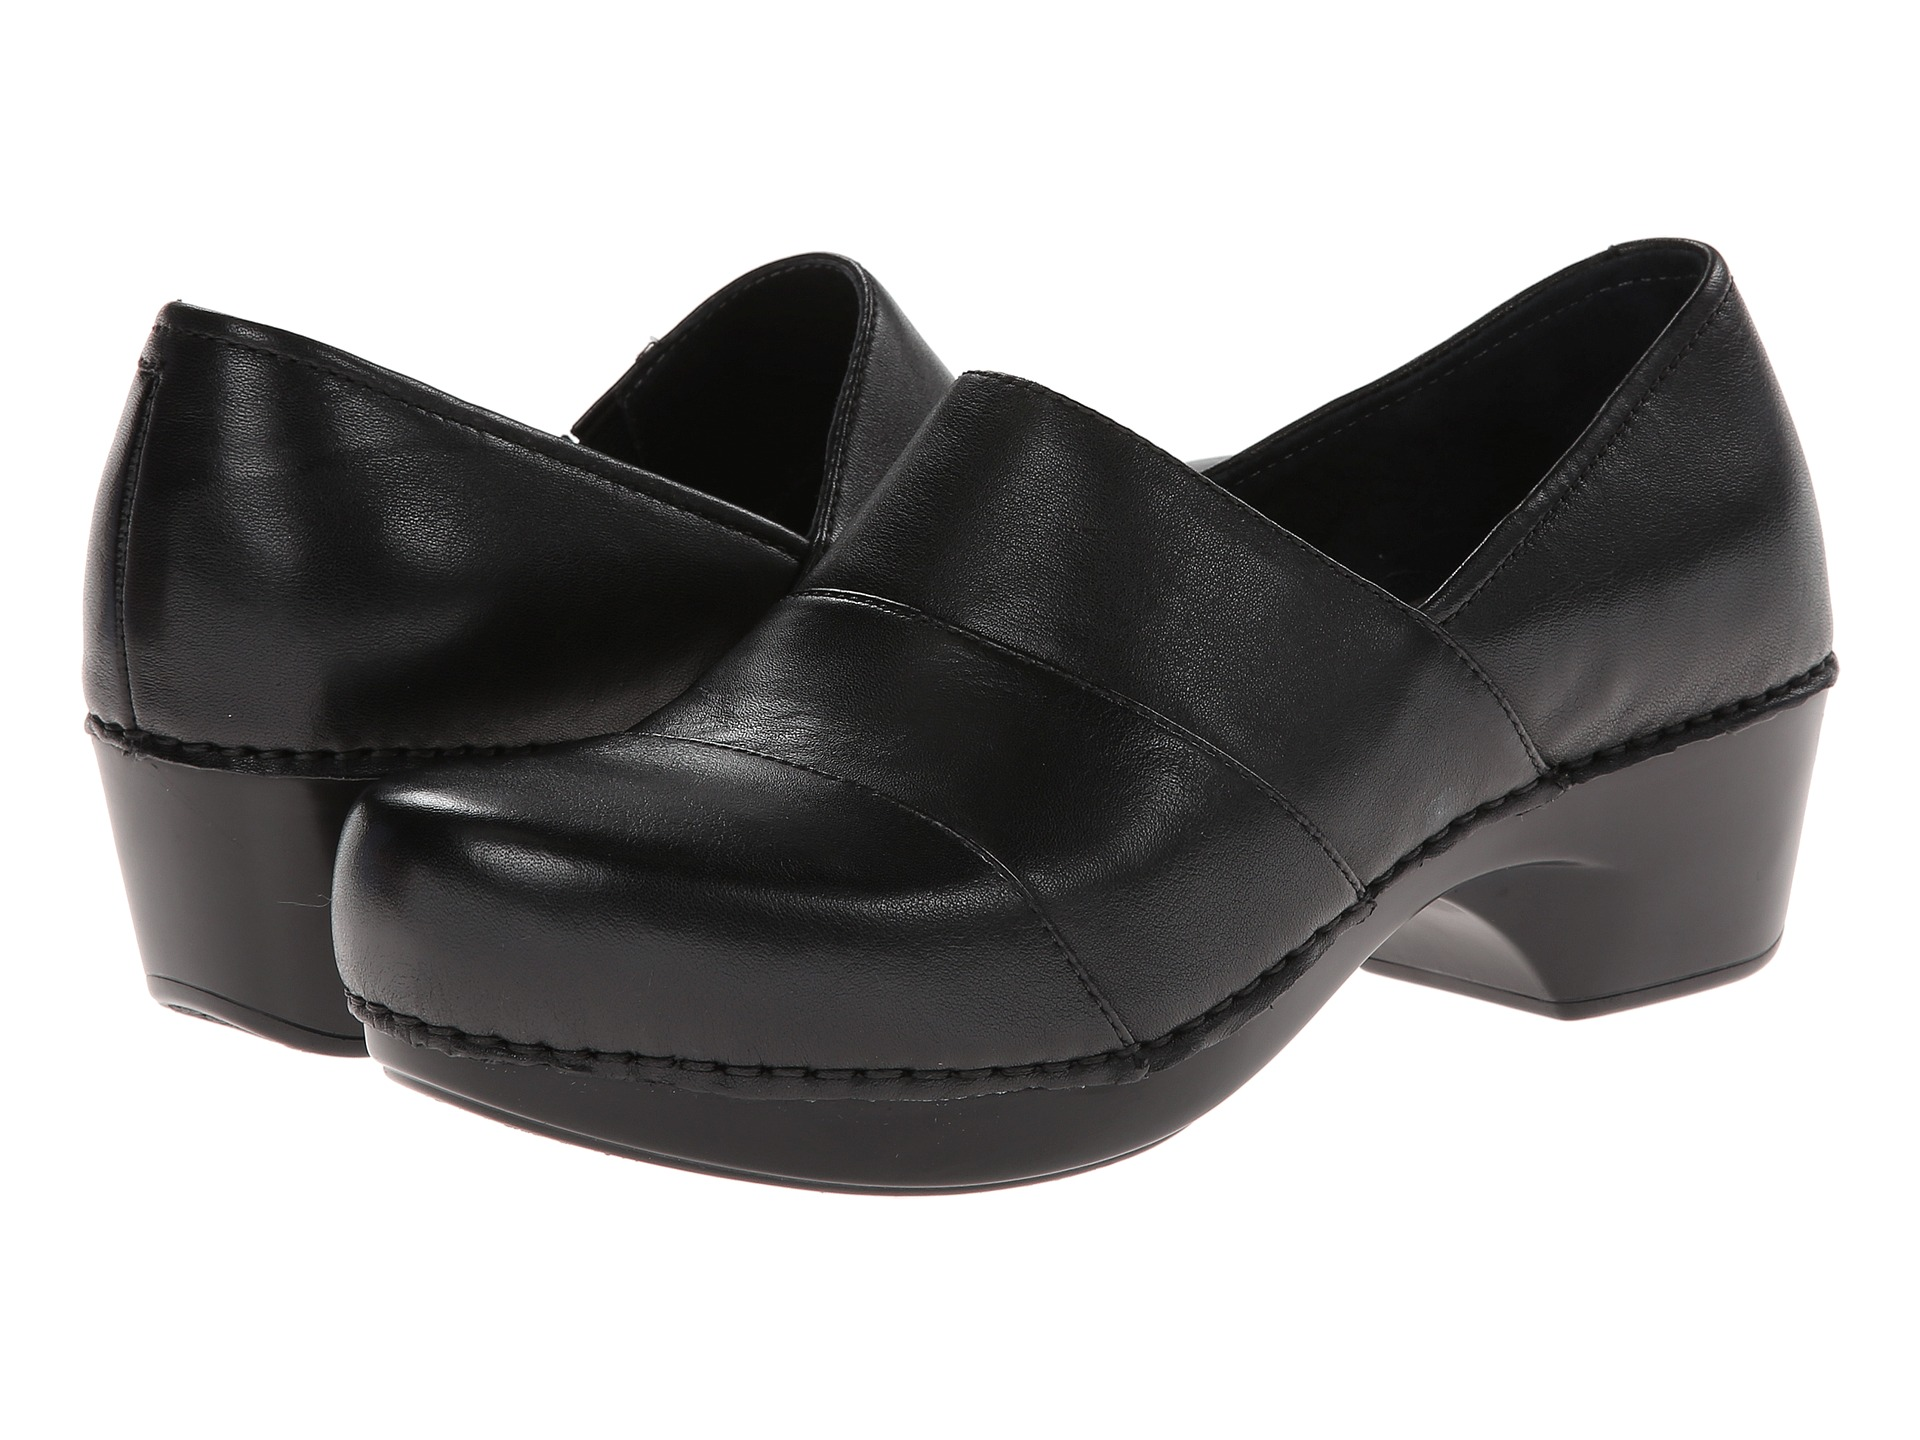 Dansko Shoes Zappos